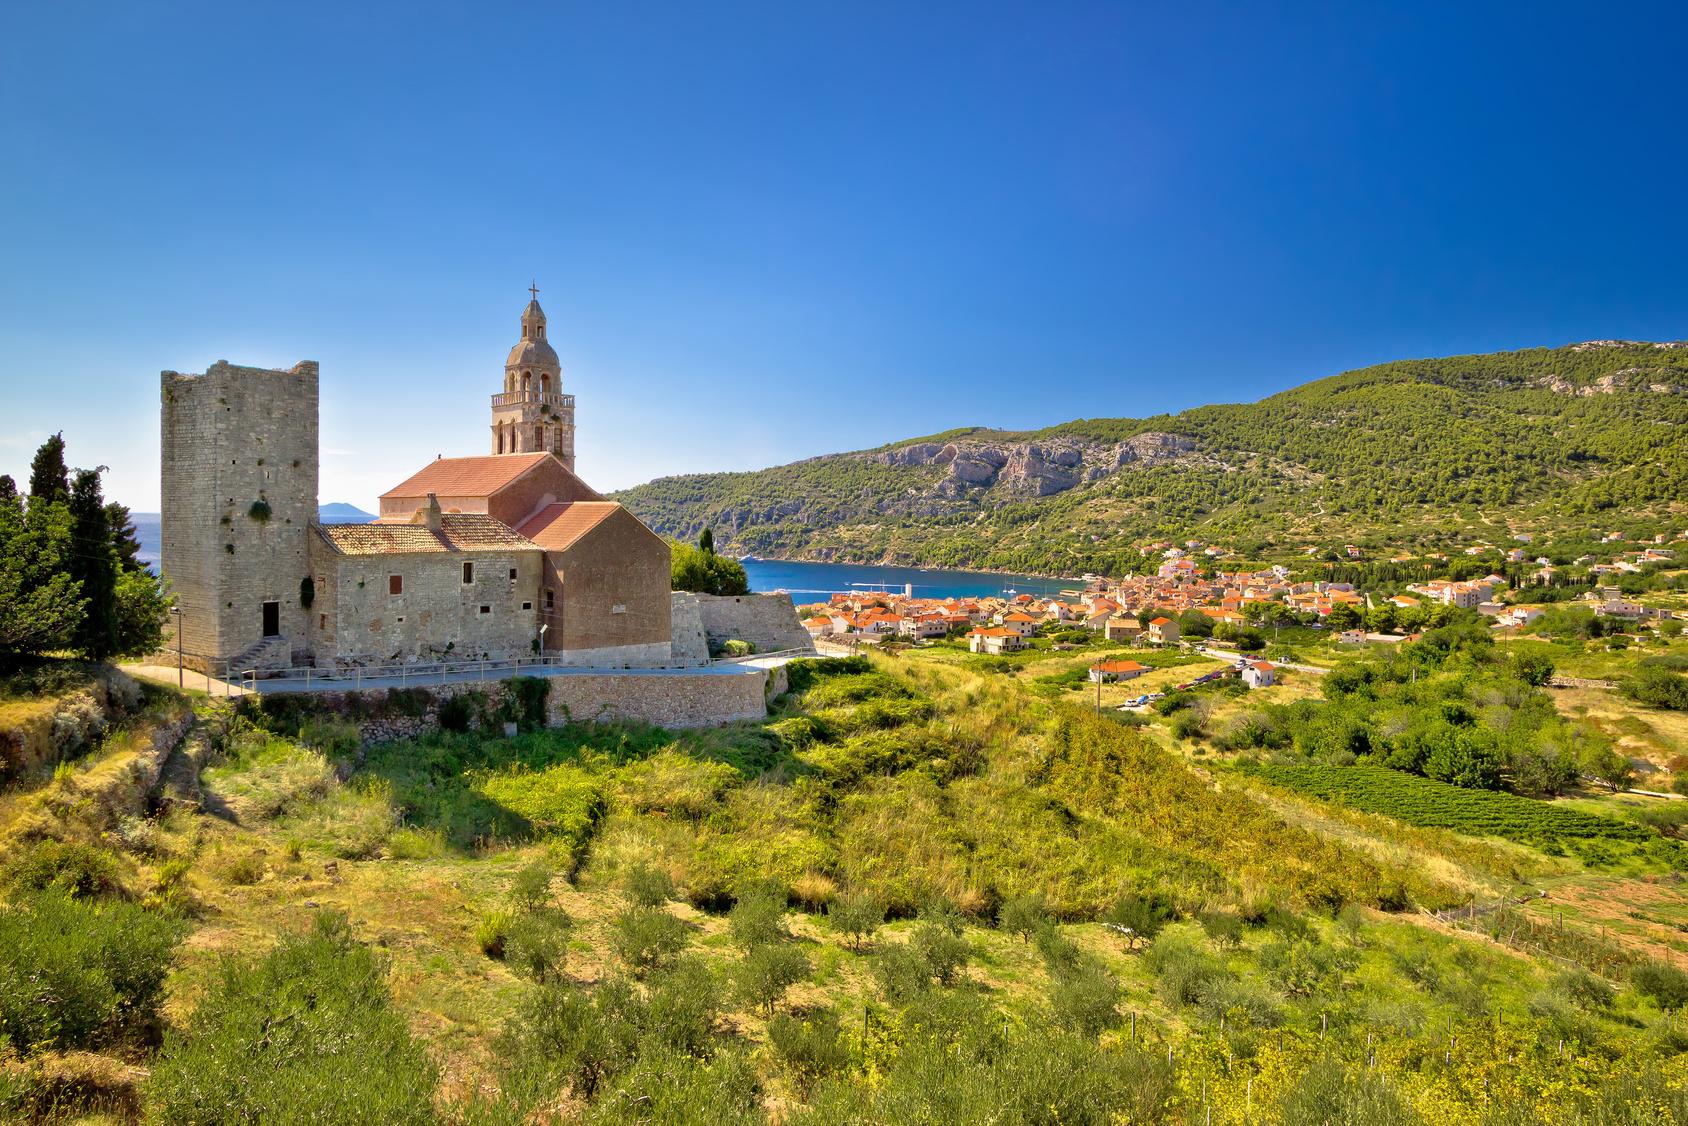 Town of Komiza on Vis island view, Dalmatia, Croatia